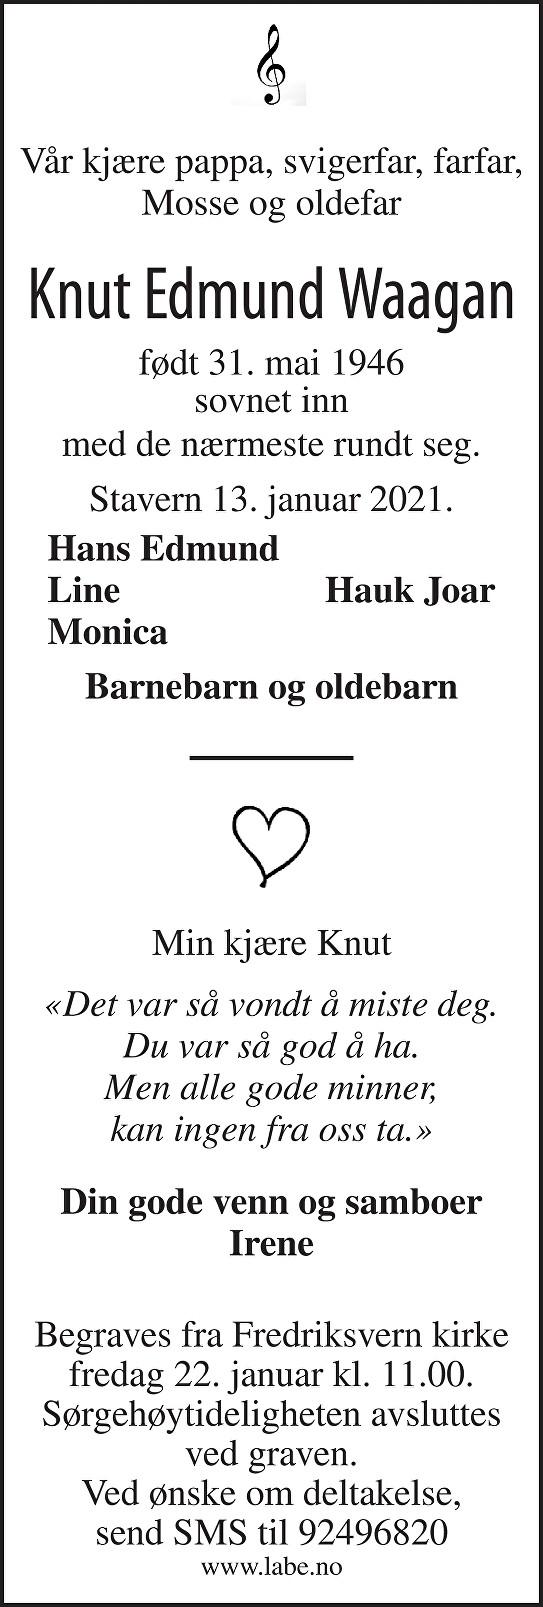 Knut Edmund Waagan Dødsannonse